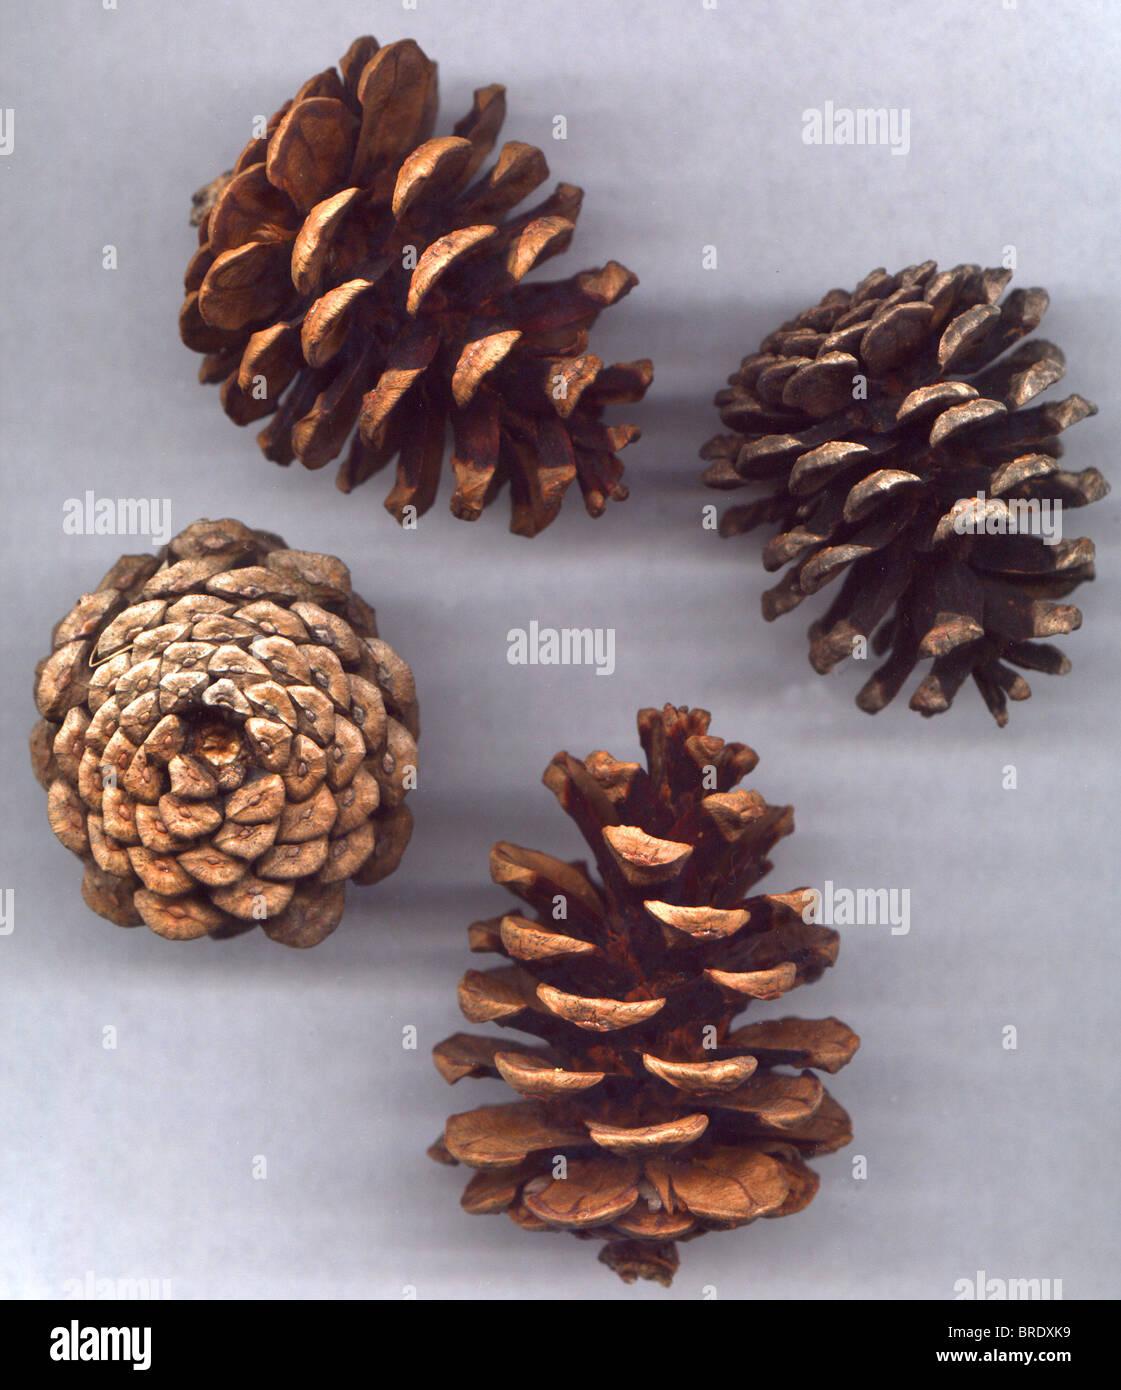 Pine Cones - Pine Tree Seeds Stock Photo, Royalty Free ...